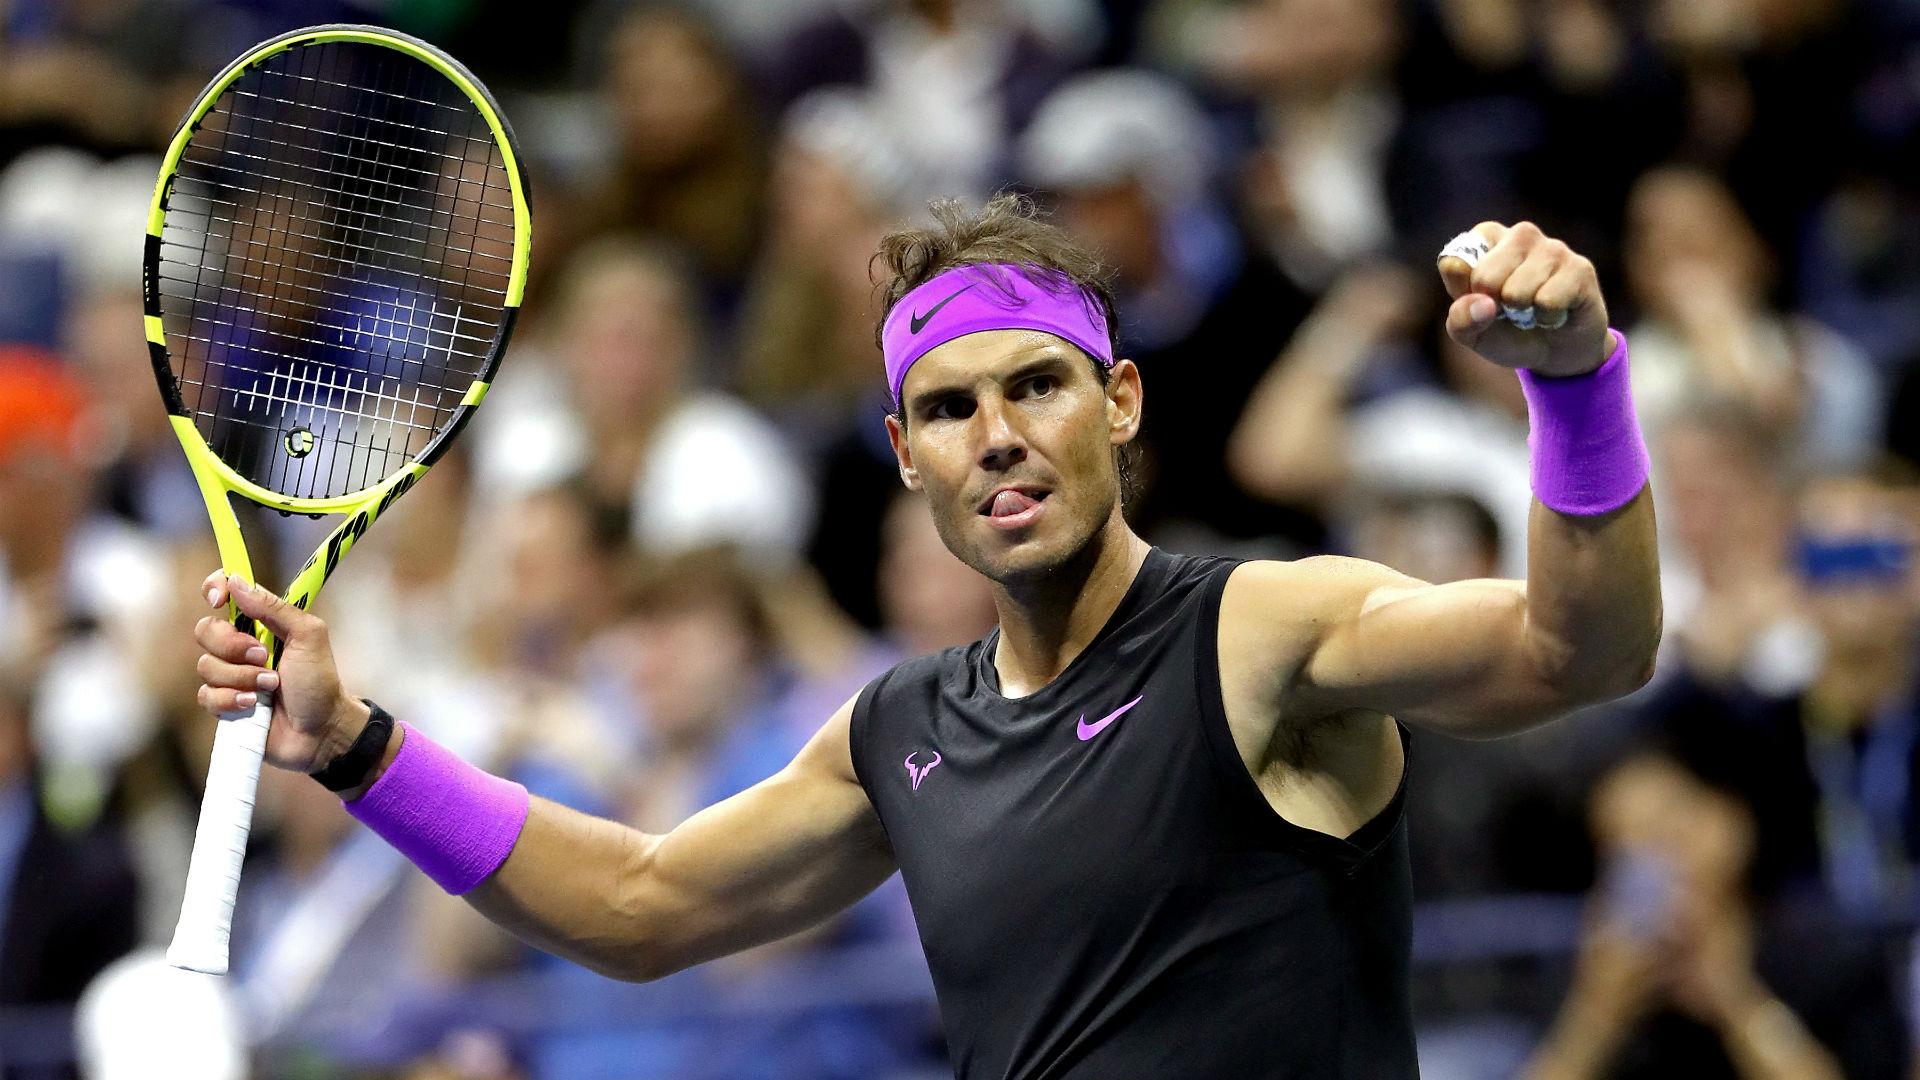 U.S. Open 2019: Rafael Nadal breaks down stubborn Matteo Berrettini to reach final